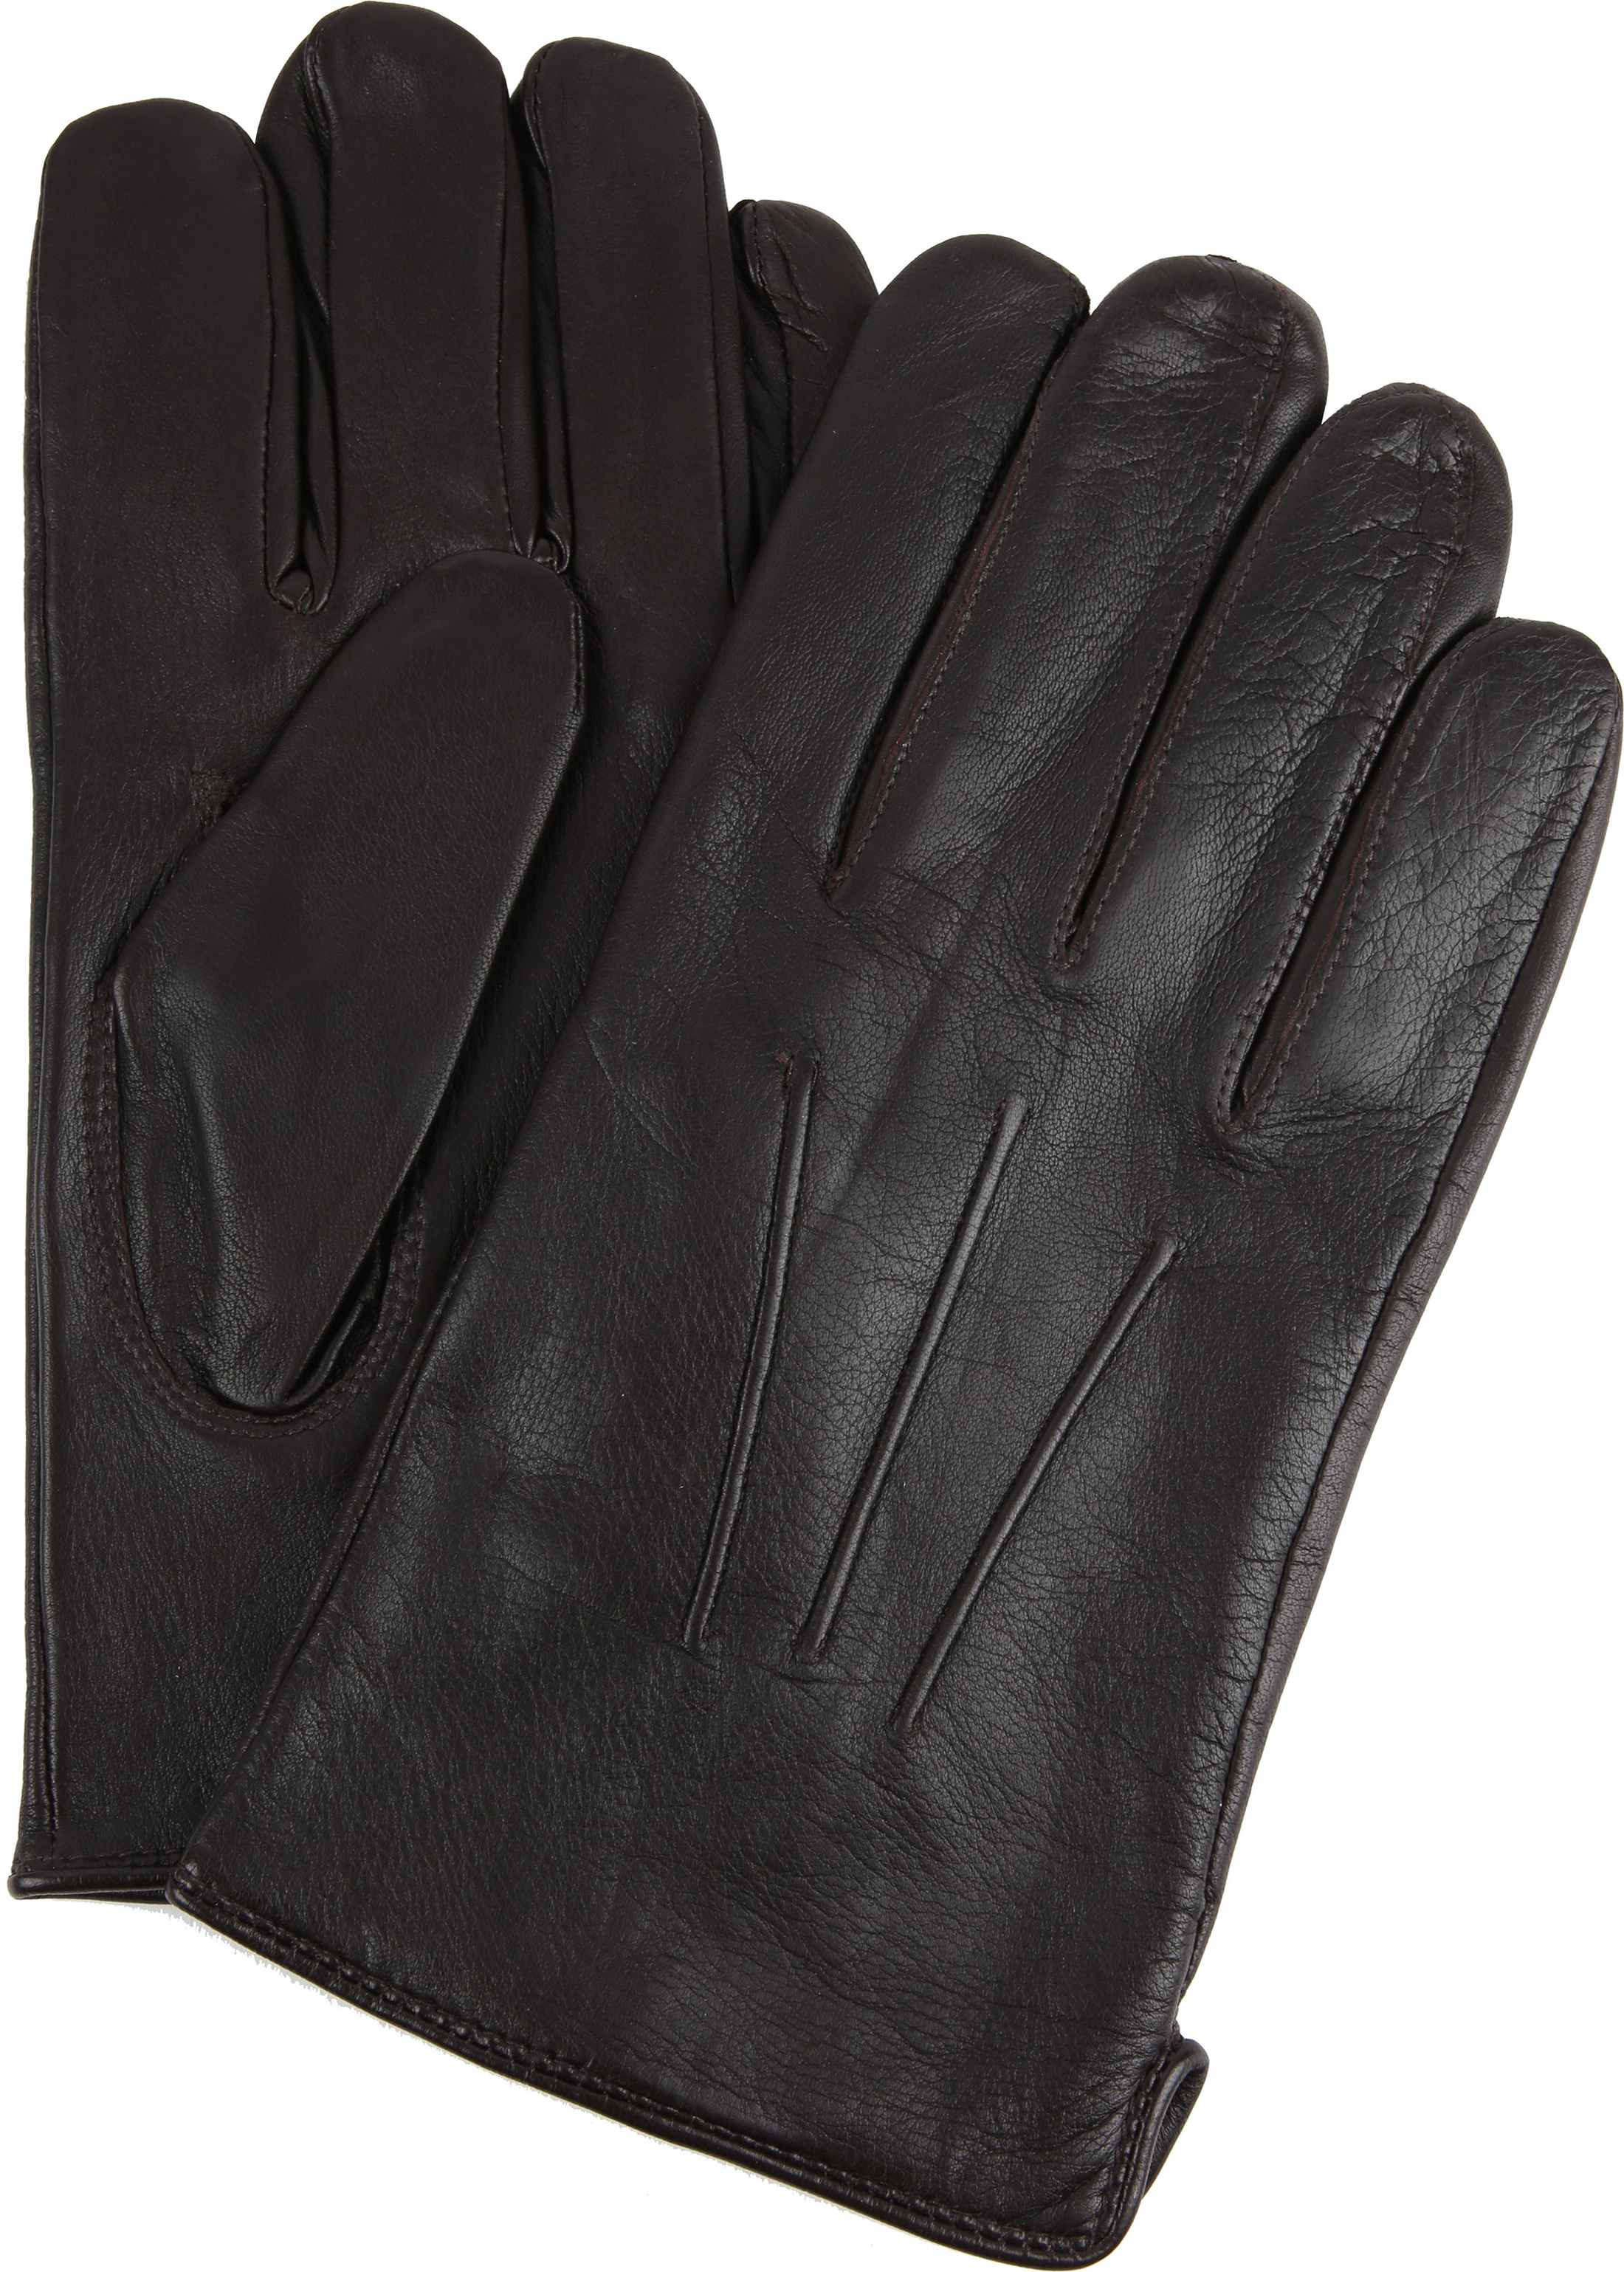 Laimbock Gloves Edinburgh Brown (Espresso) photo 0